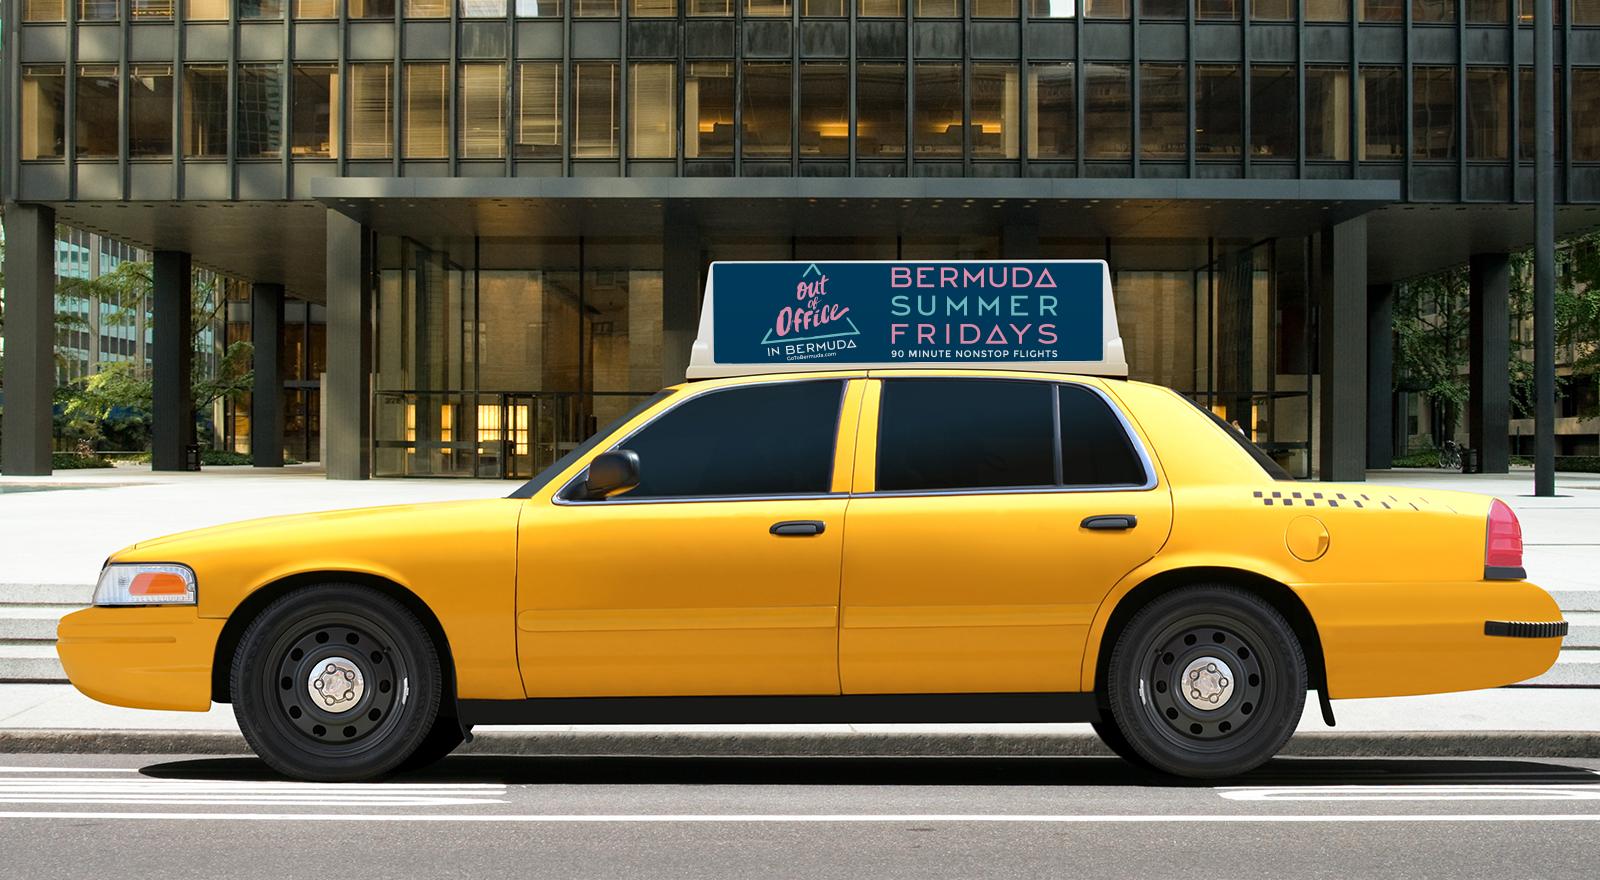 Bermuda taxi ad